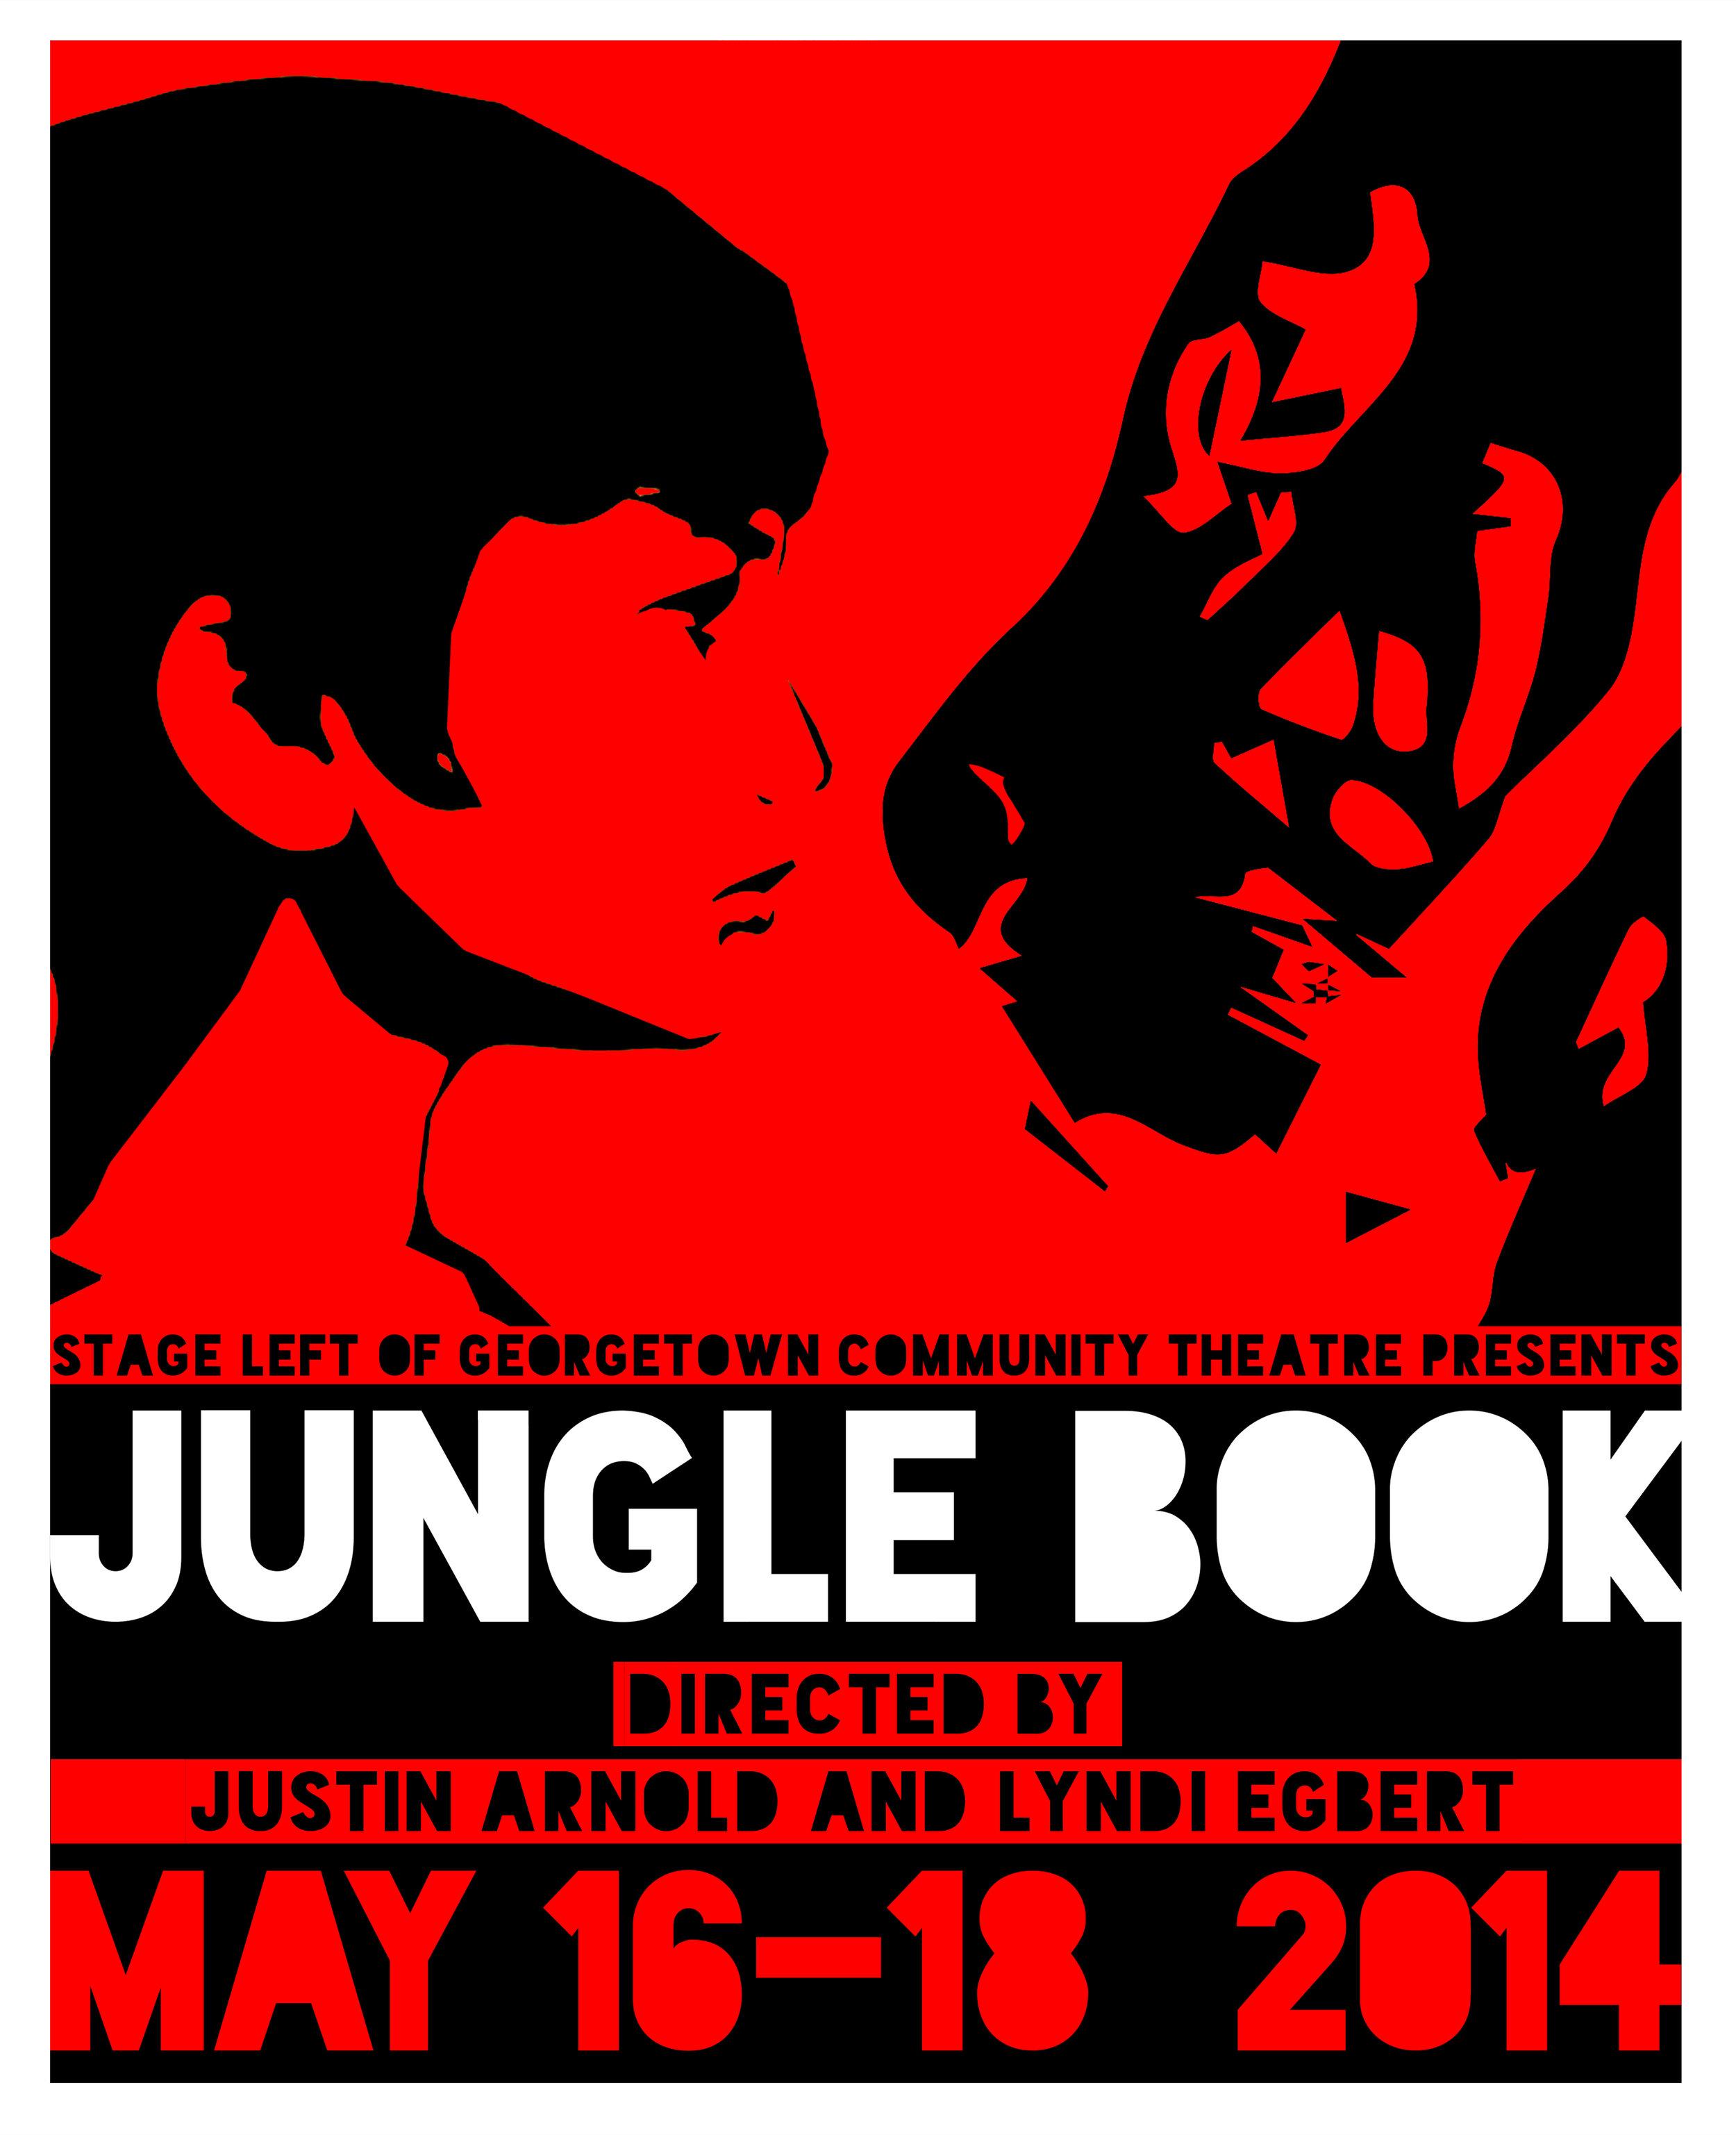 JungleBook copy 2.jpg